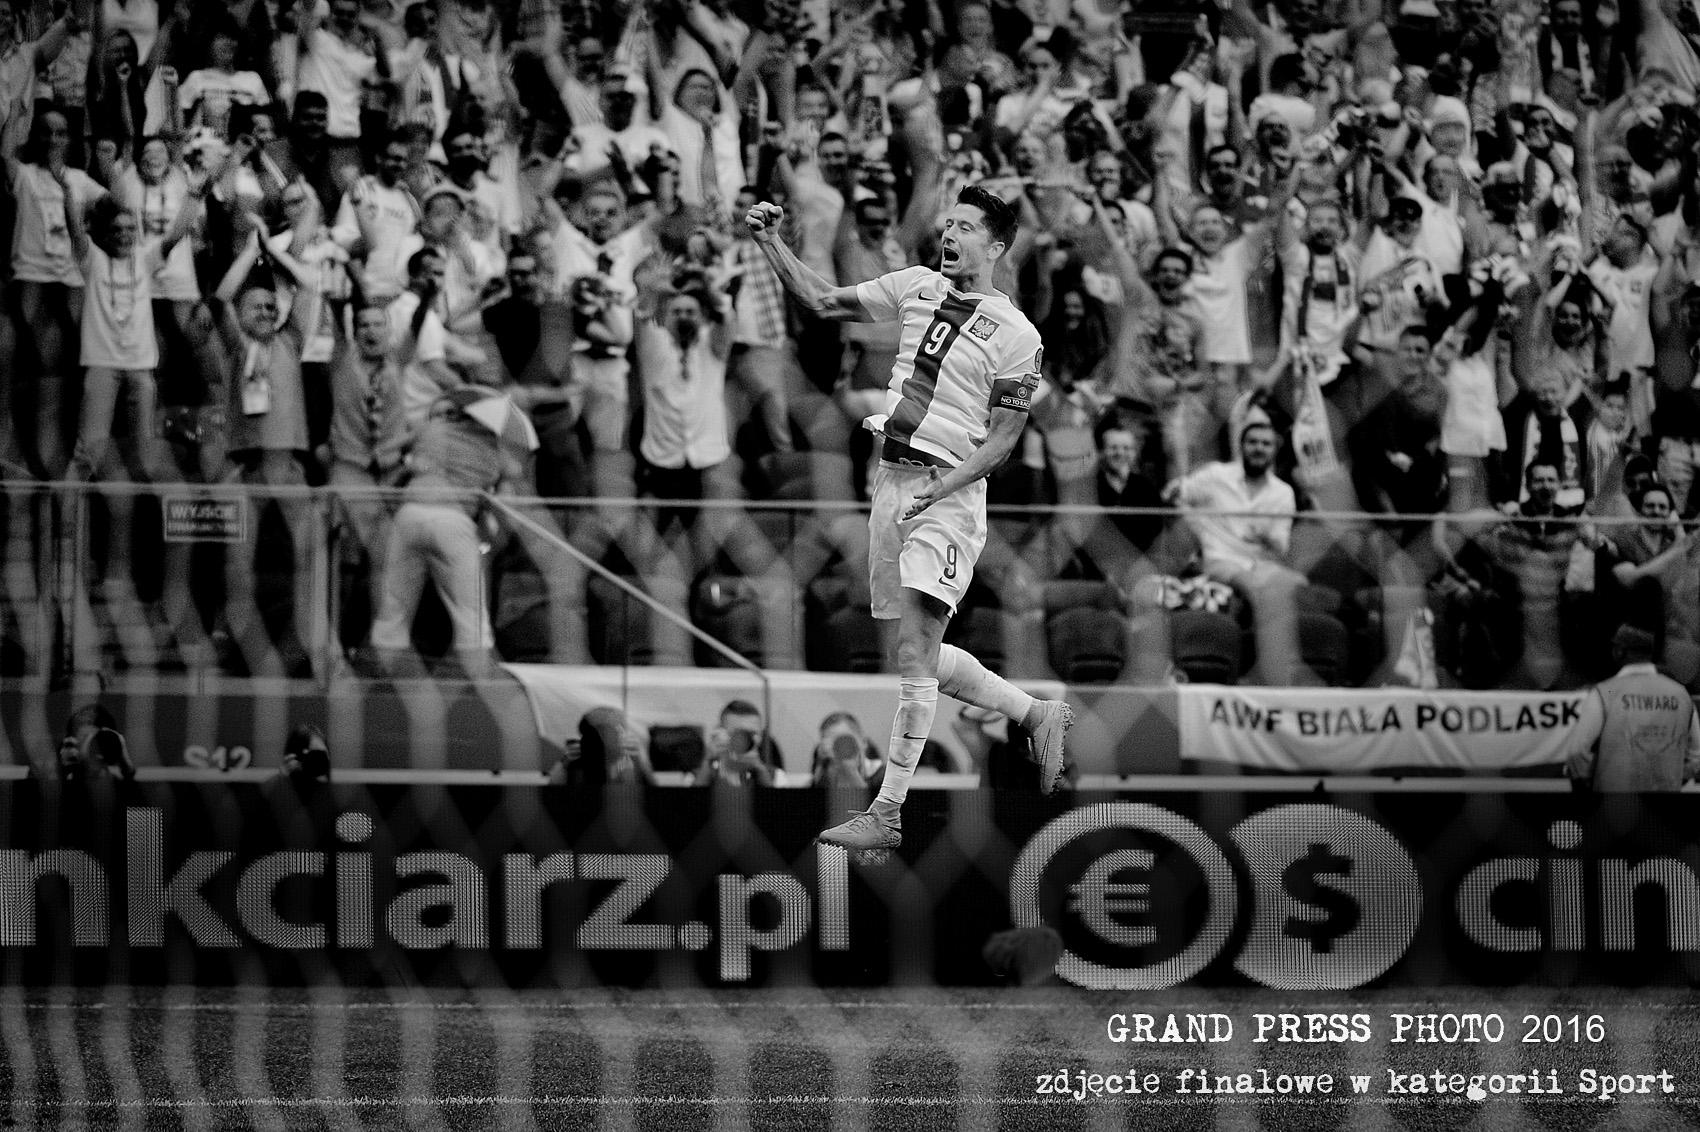 grand-press-photo-2016-piotr-blawicki-fotoblog-robert-lewandowski-sport-final